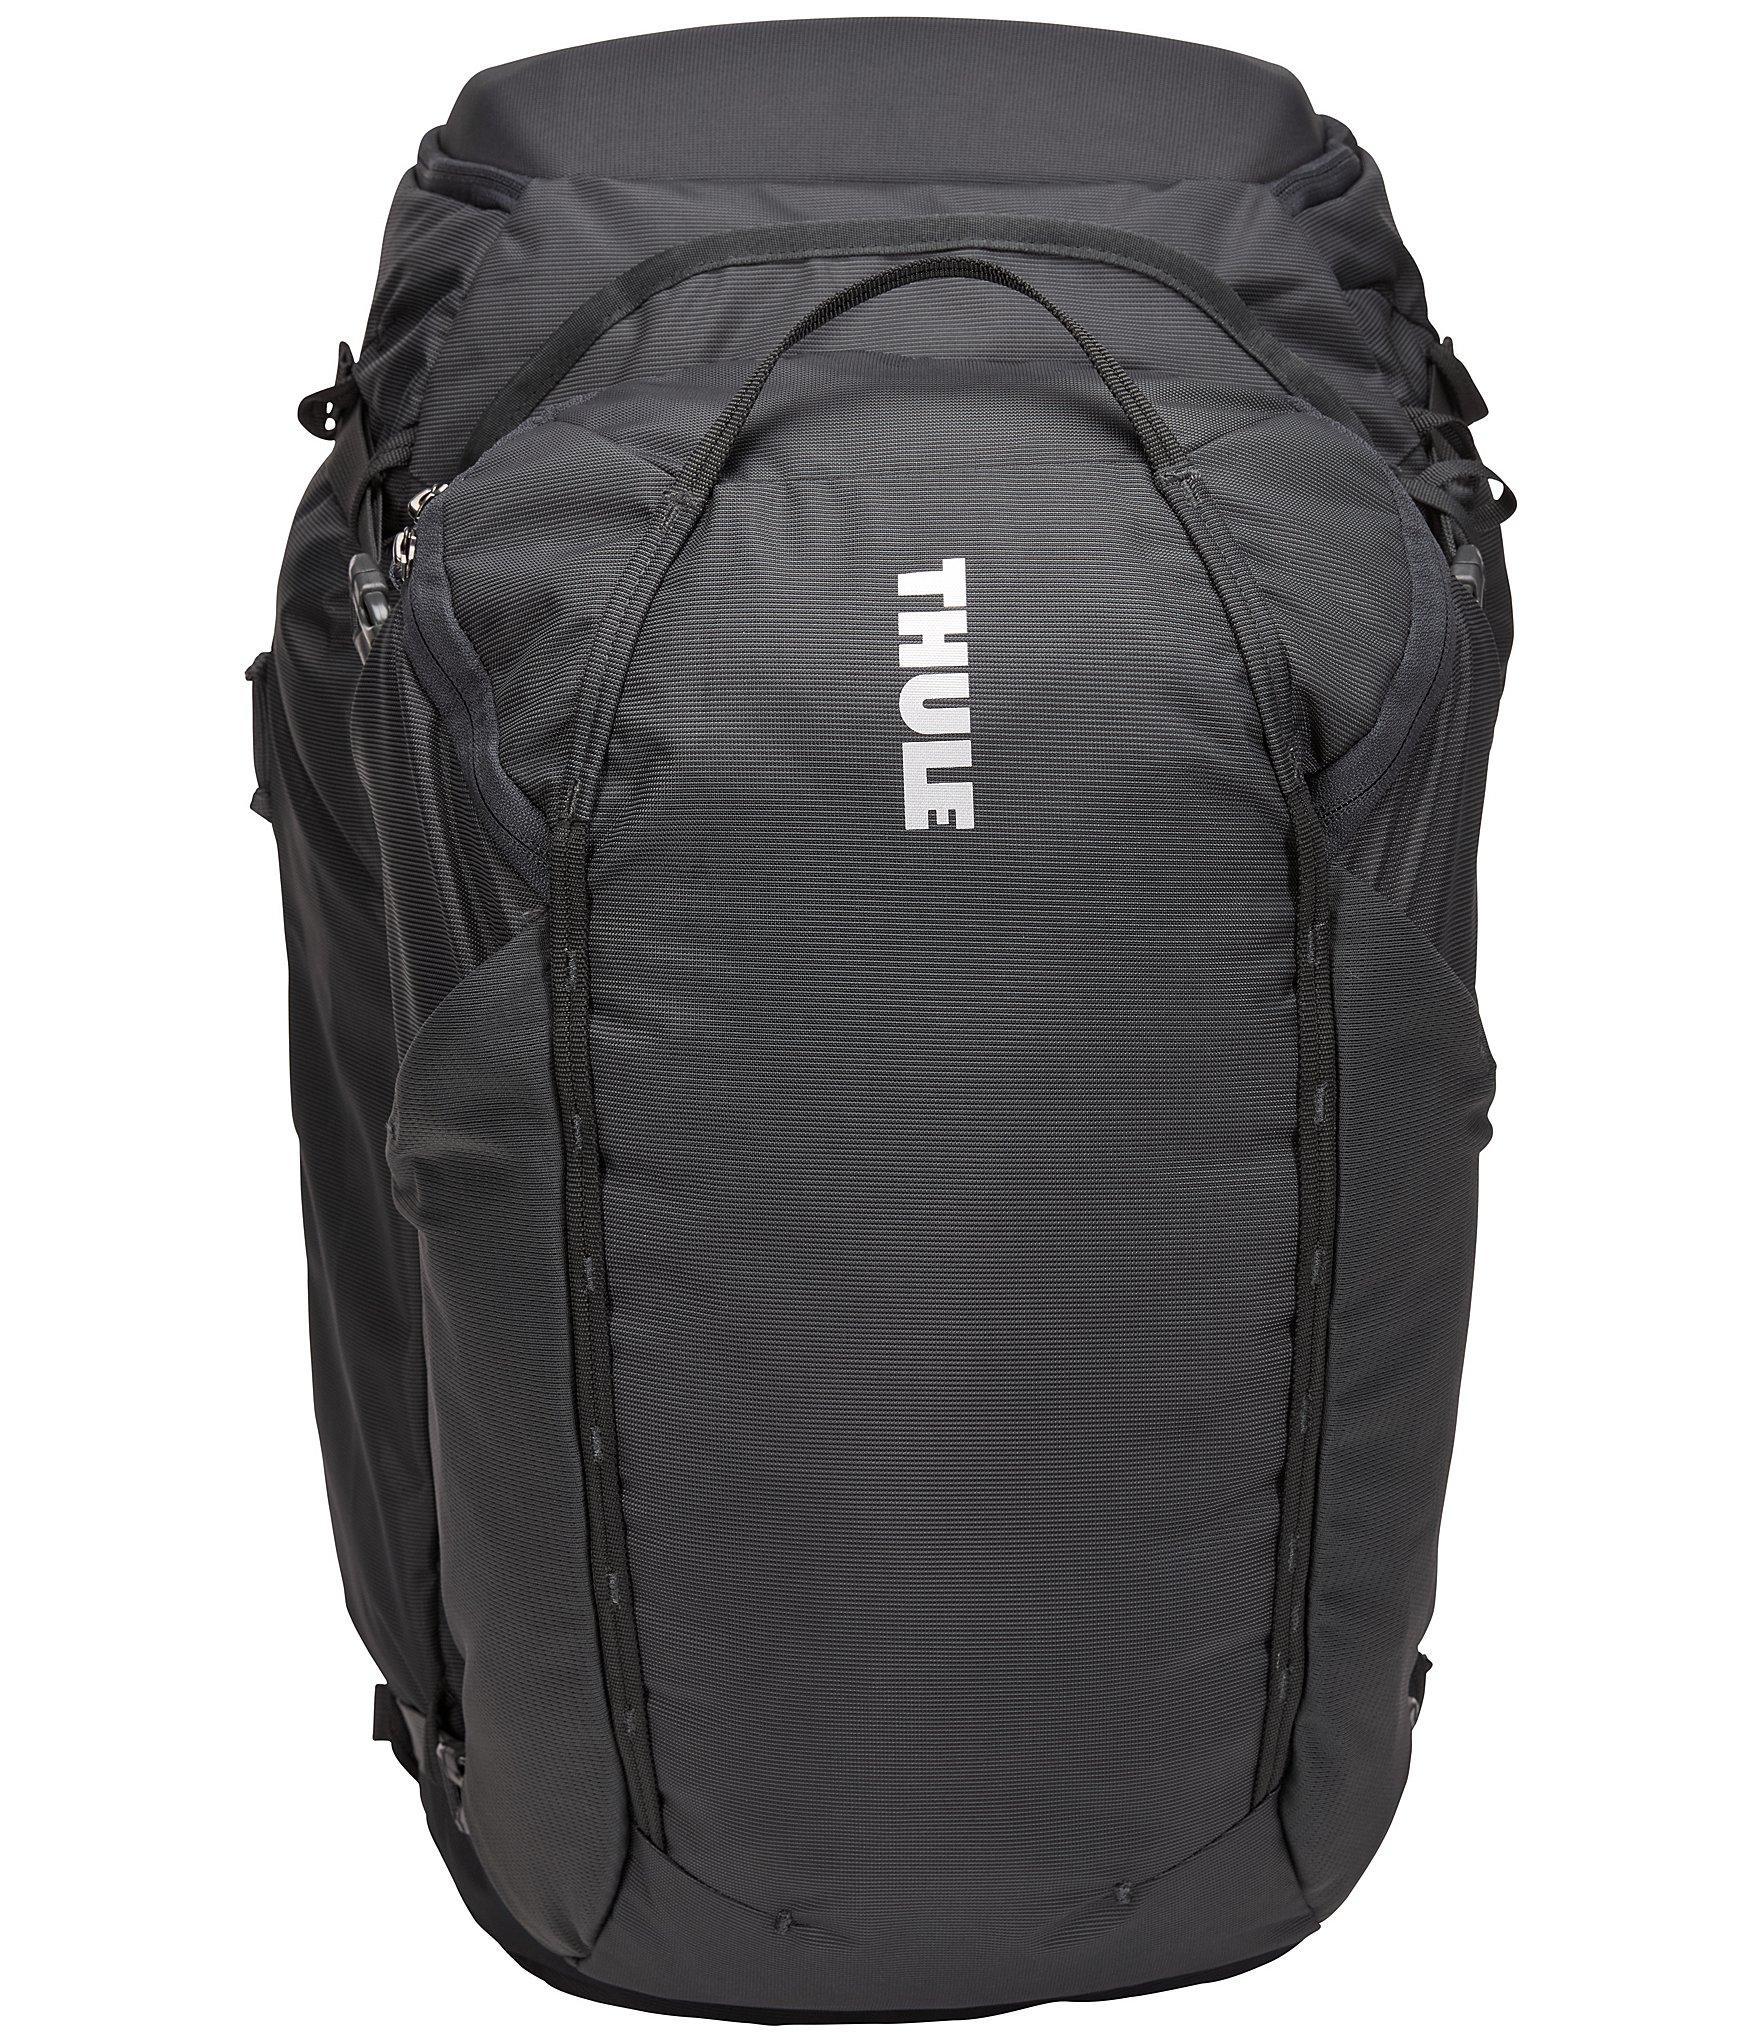 892542283 black bag: Luggage & Travel Accessories | Dillard's